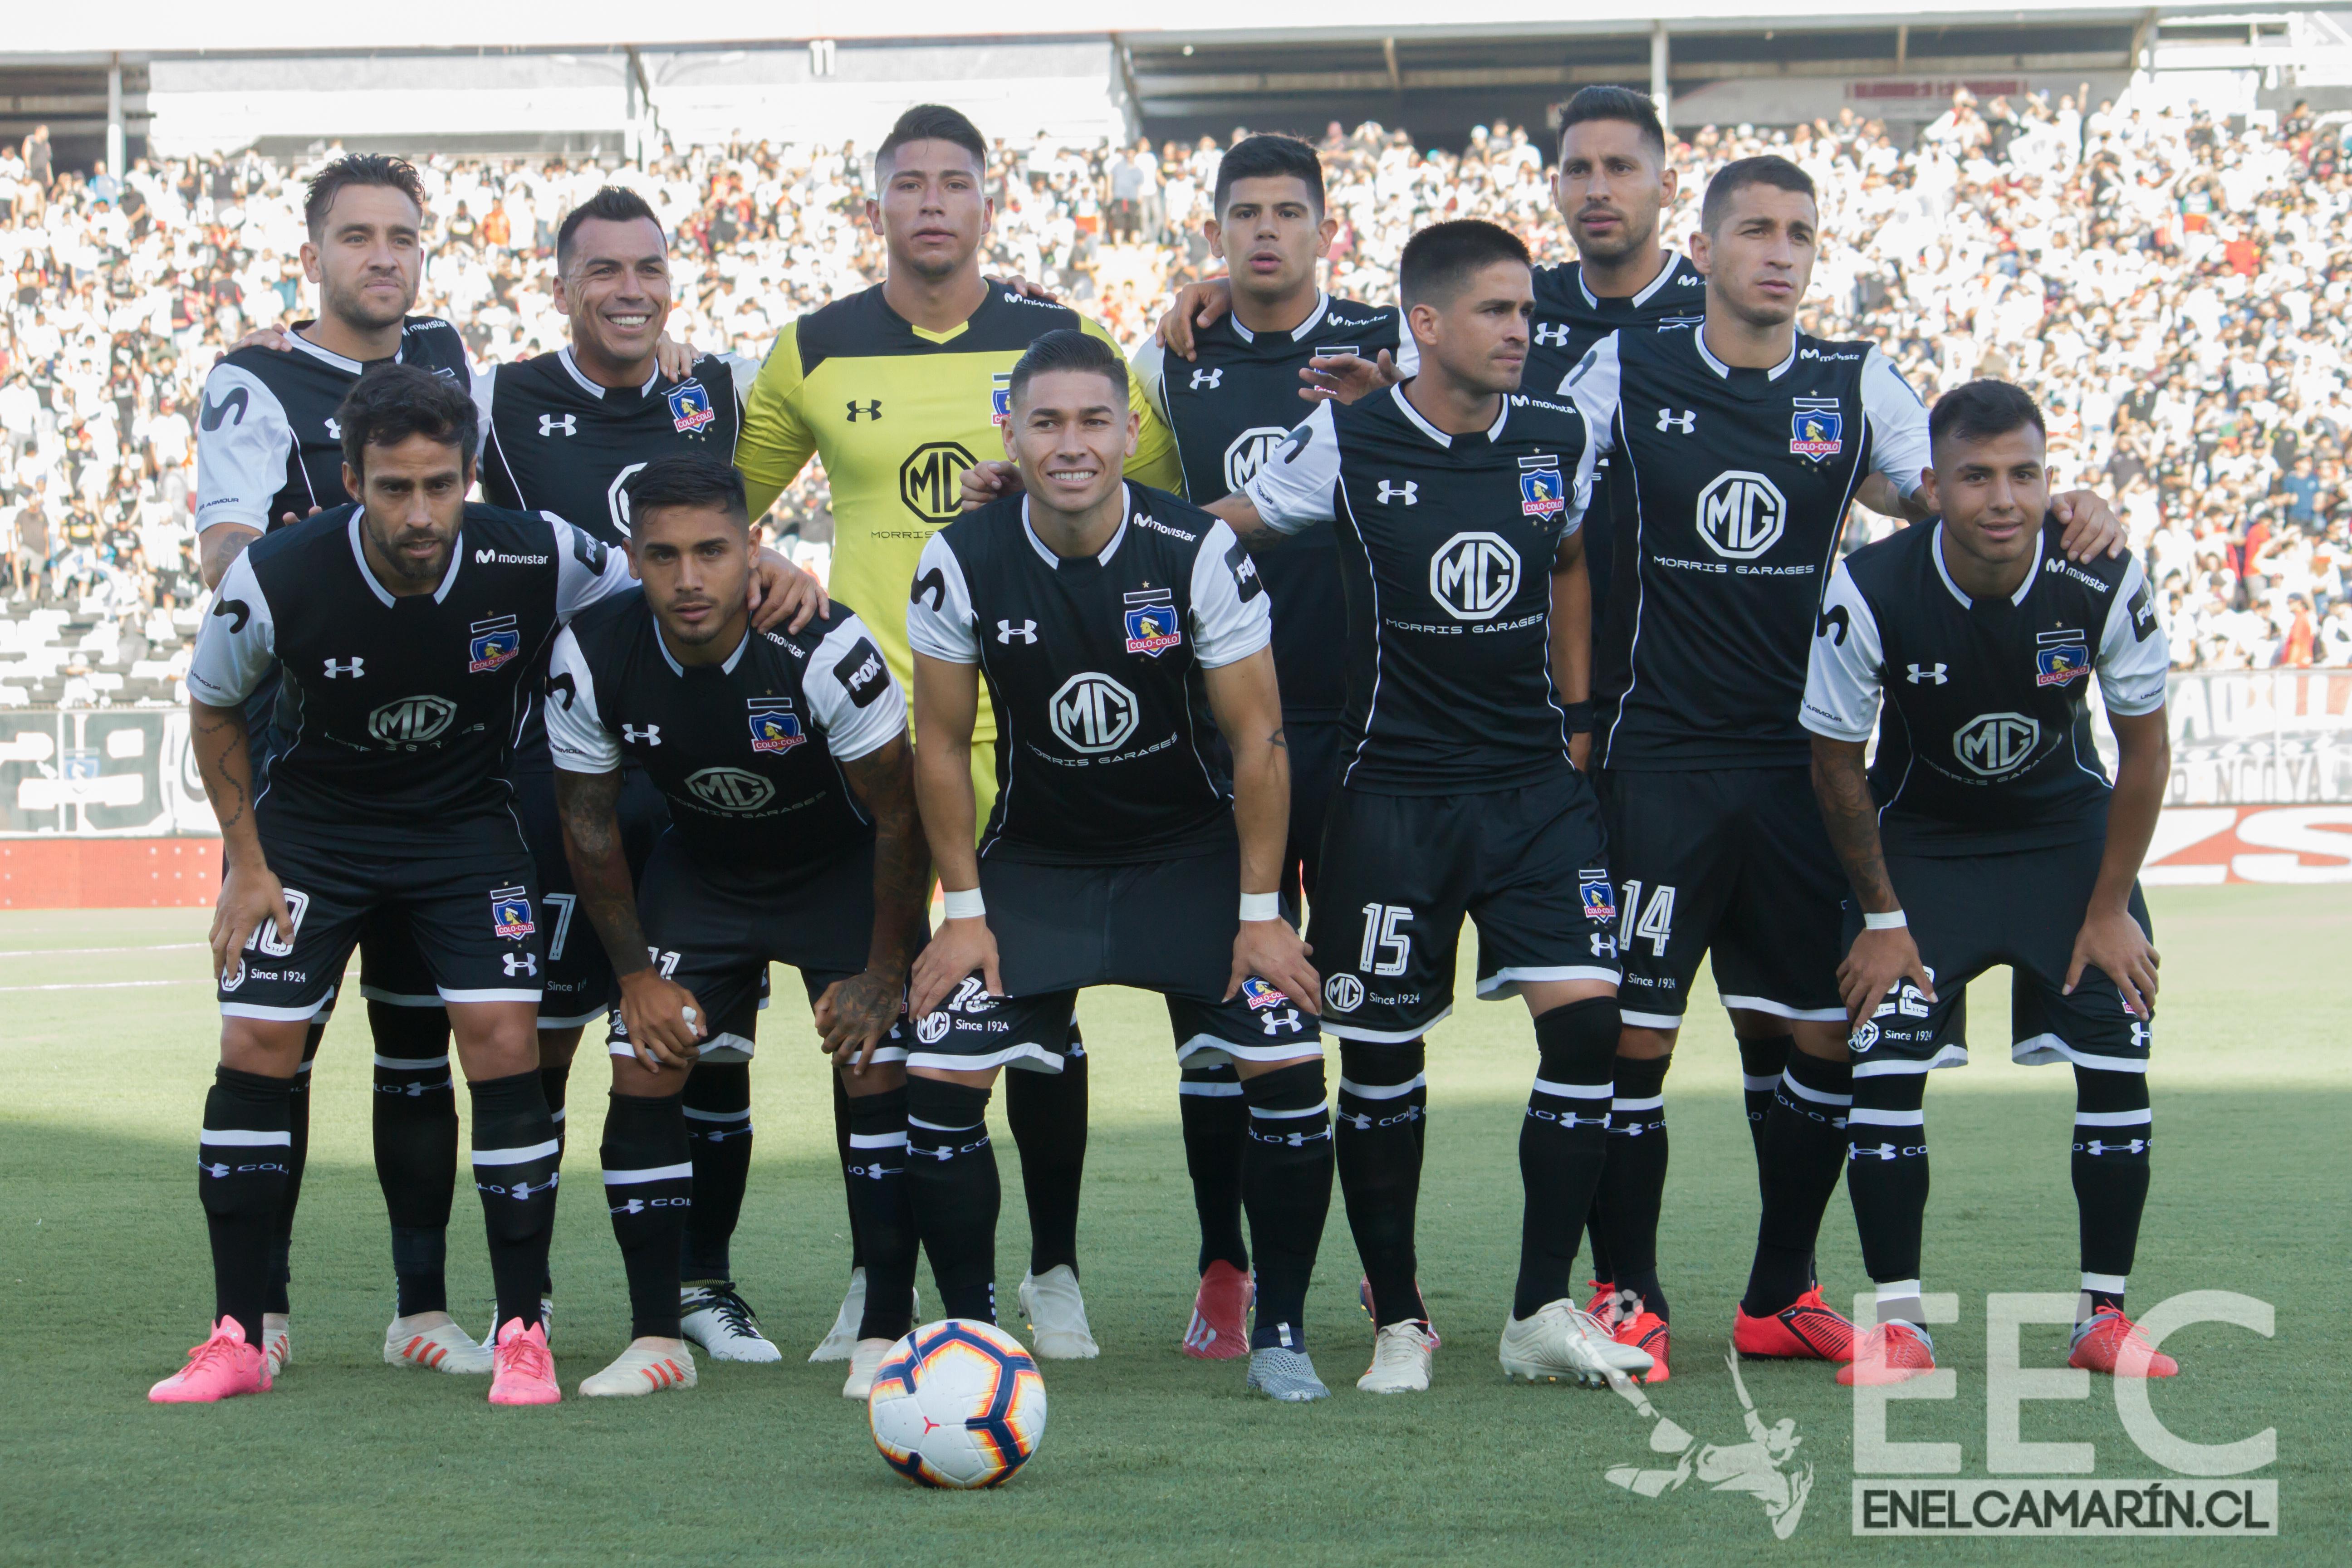 Colo Colo 0 - Estudiantes de la Plata 2 (Noche Alba 2019)